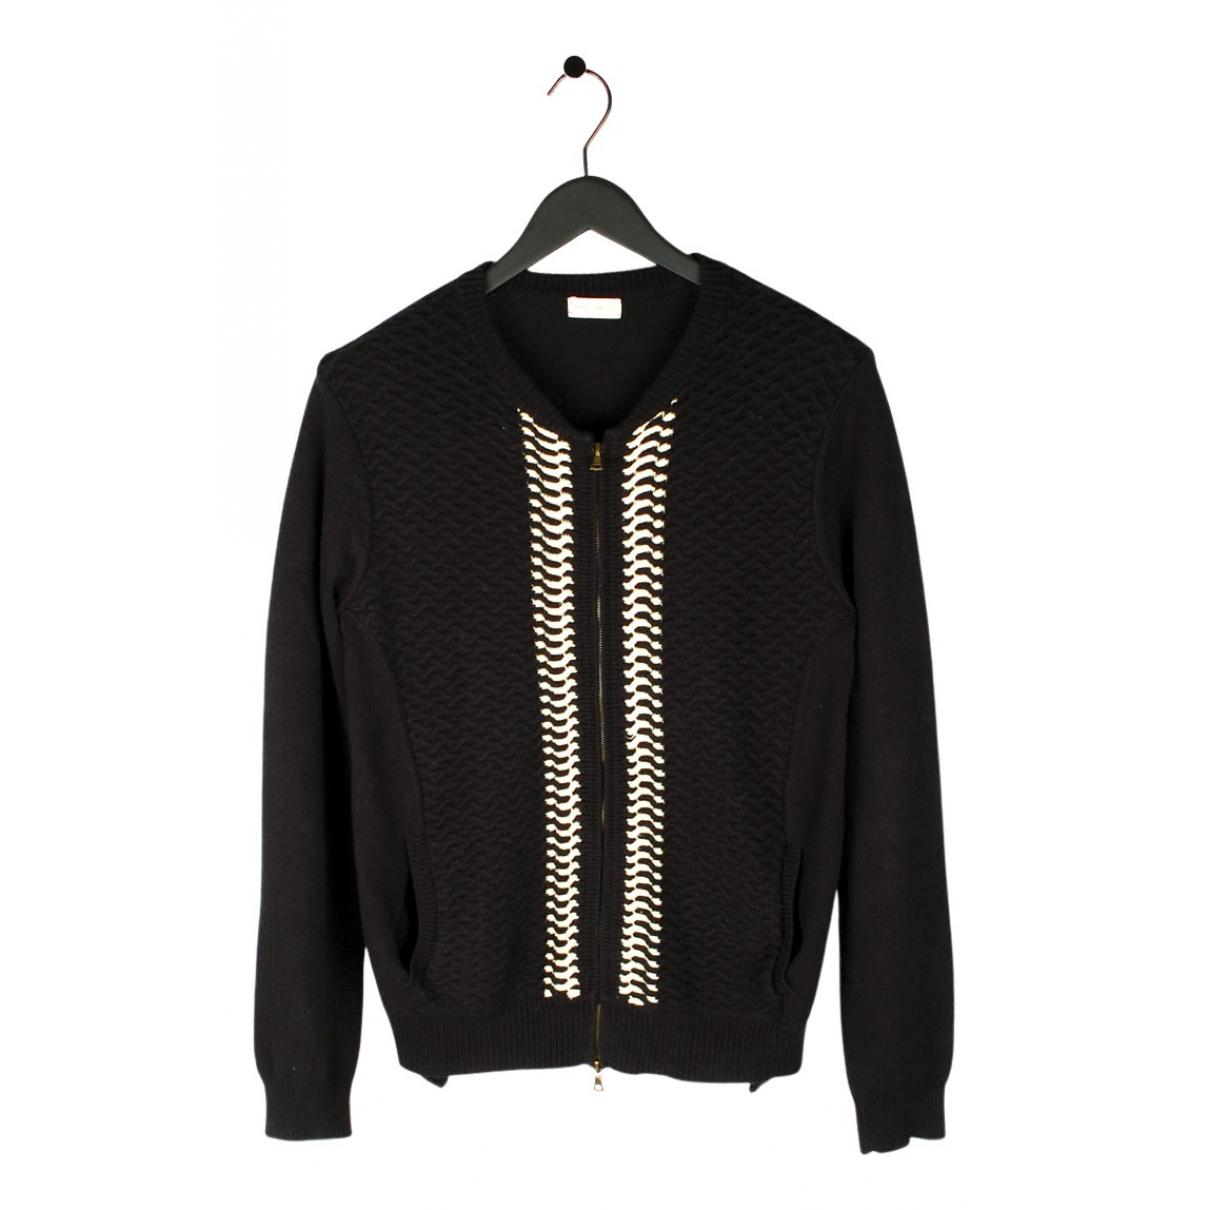 Dries Van Noten N Black Knitwear & Sweatshirts for Men M International